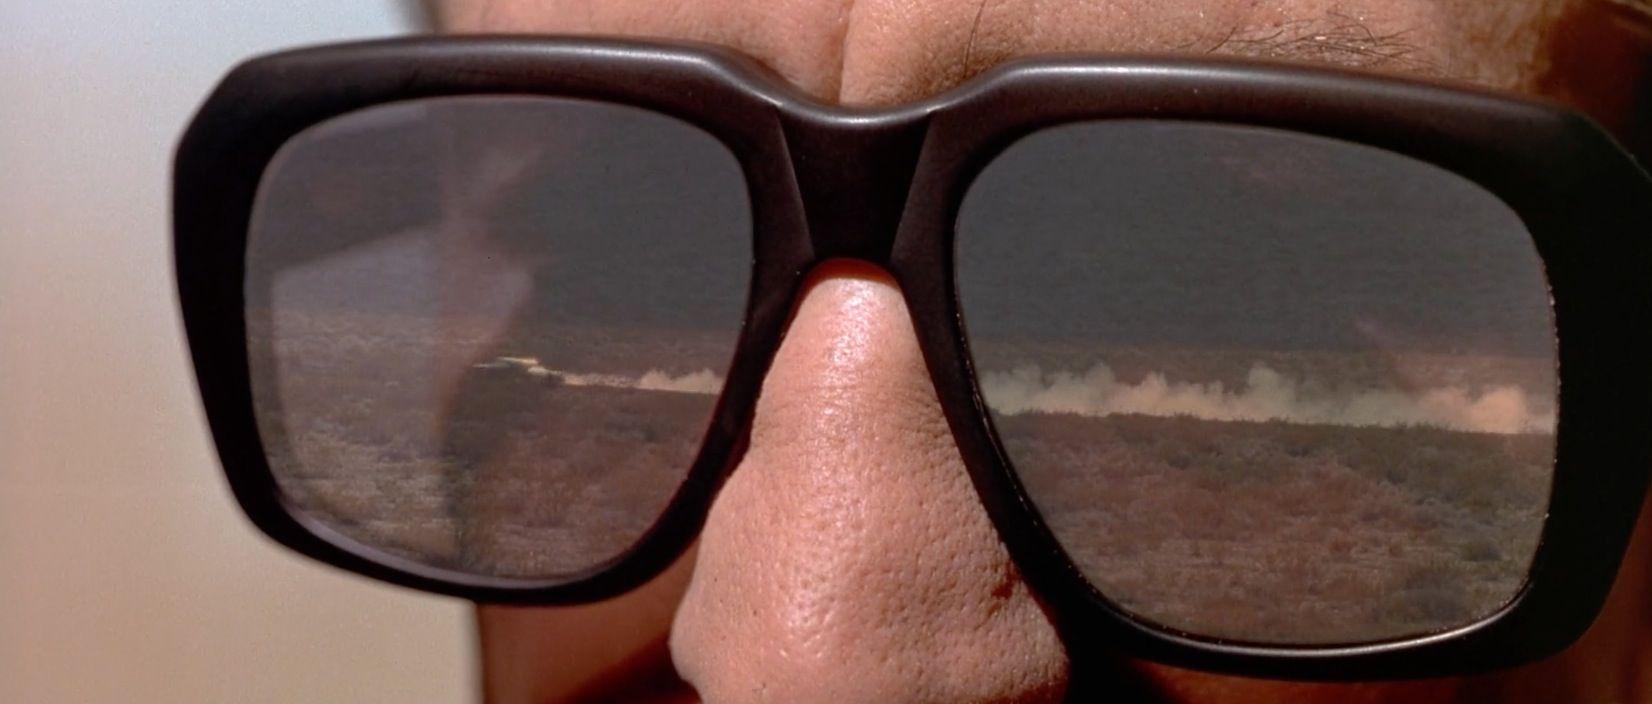 1b7d6f2ade Ultra Goliath II vintage sunglasses worn by Robert De Niro in CASINO